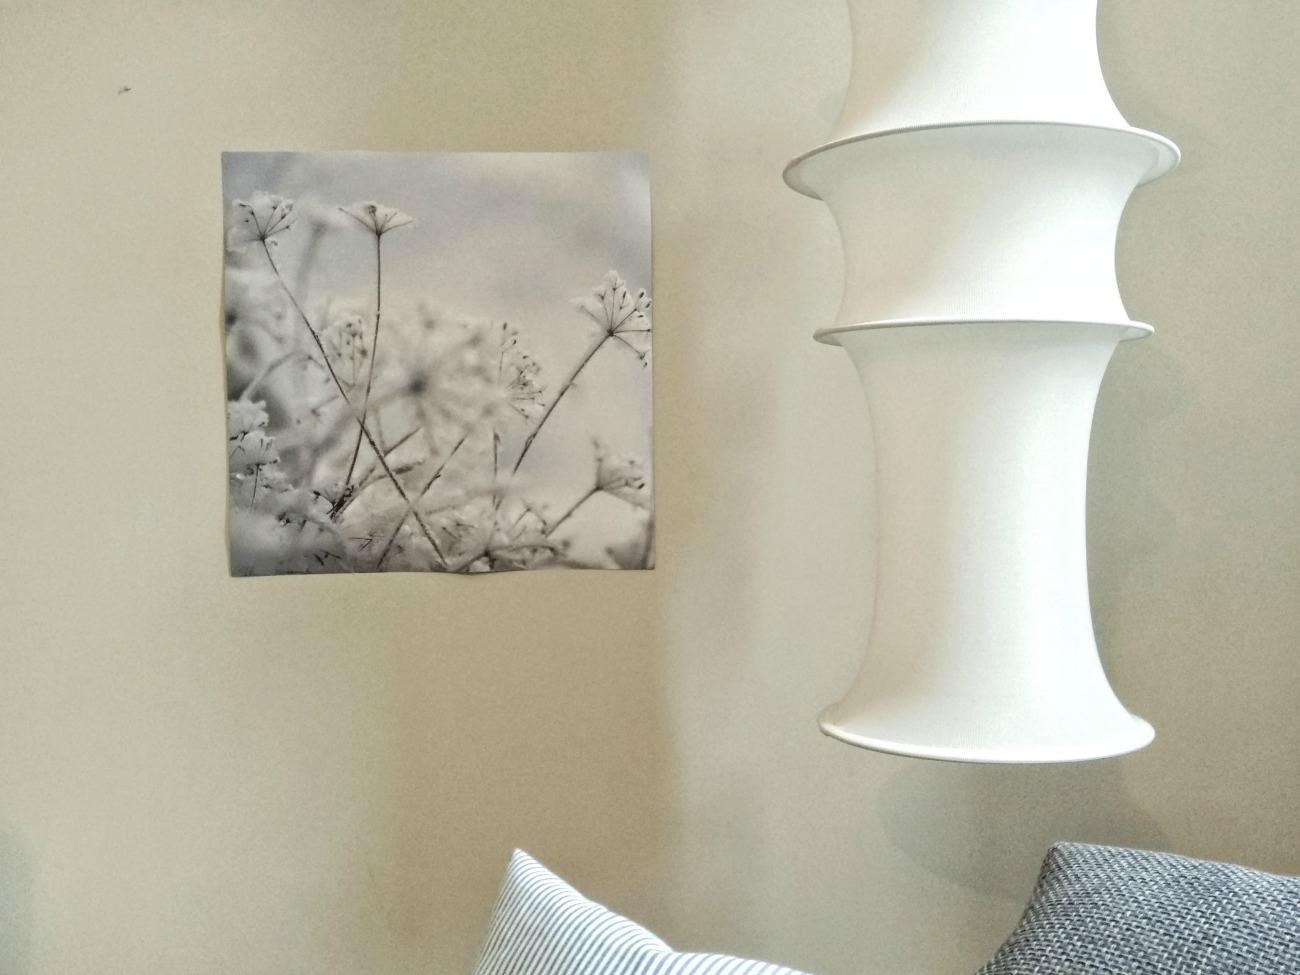 Carta da parati mood invernale per le pareti di casa for Carta da parati tonin casa